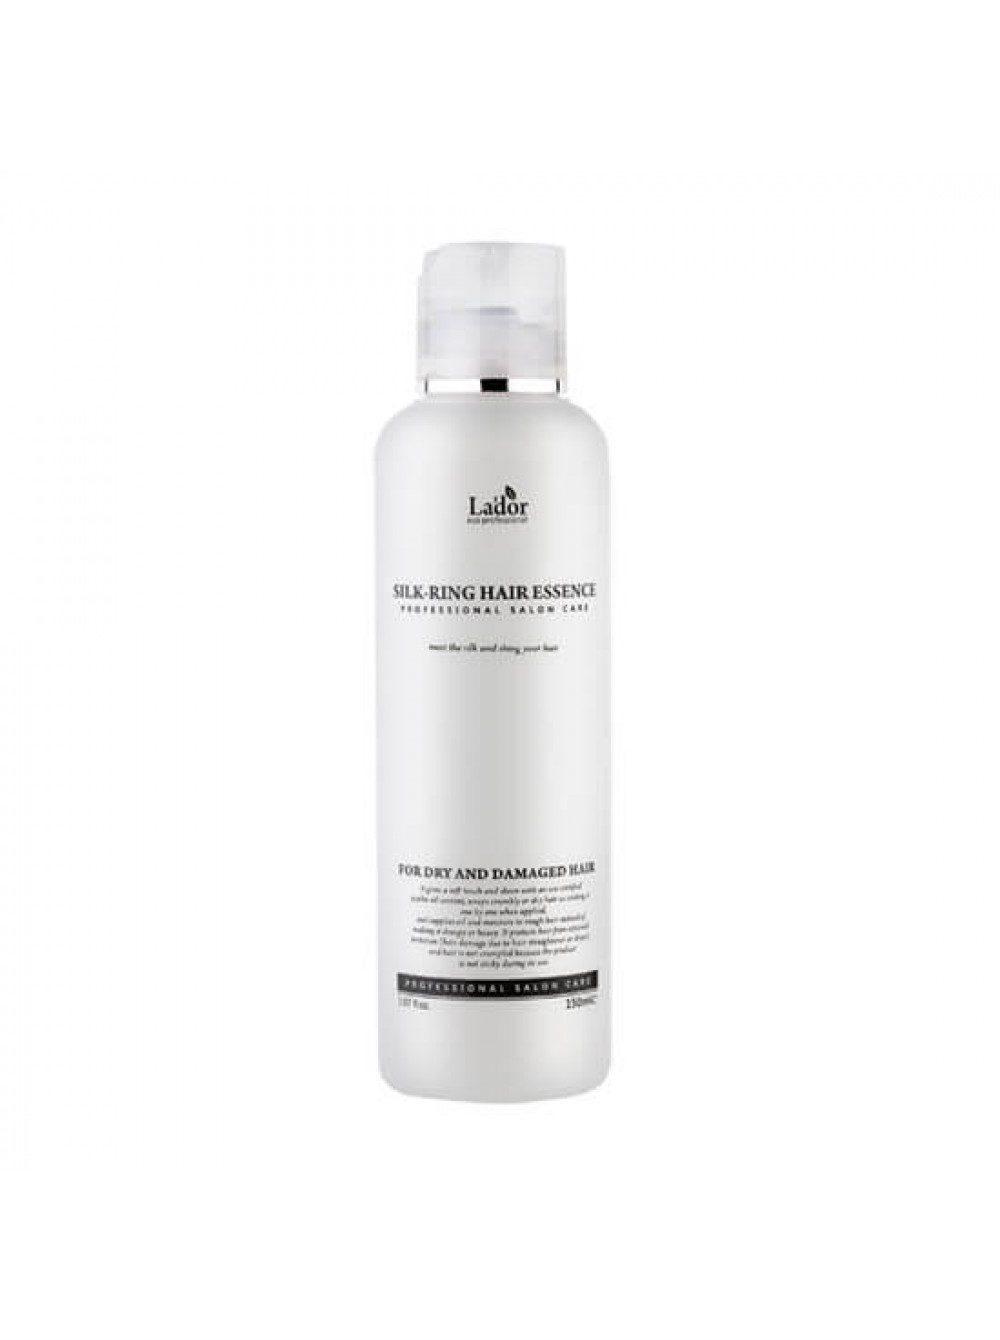 La'dor Silk-Ring Hair Essence, Восстанавливающая шелковая эссенция для волос, 150 мл